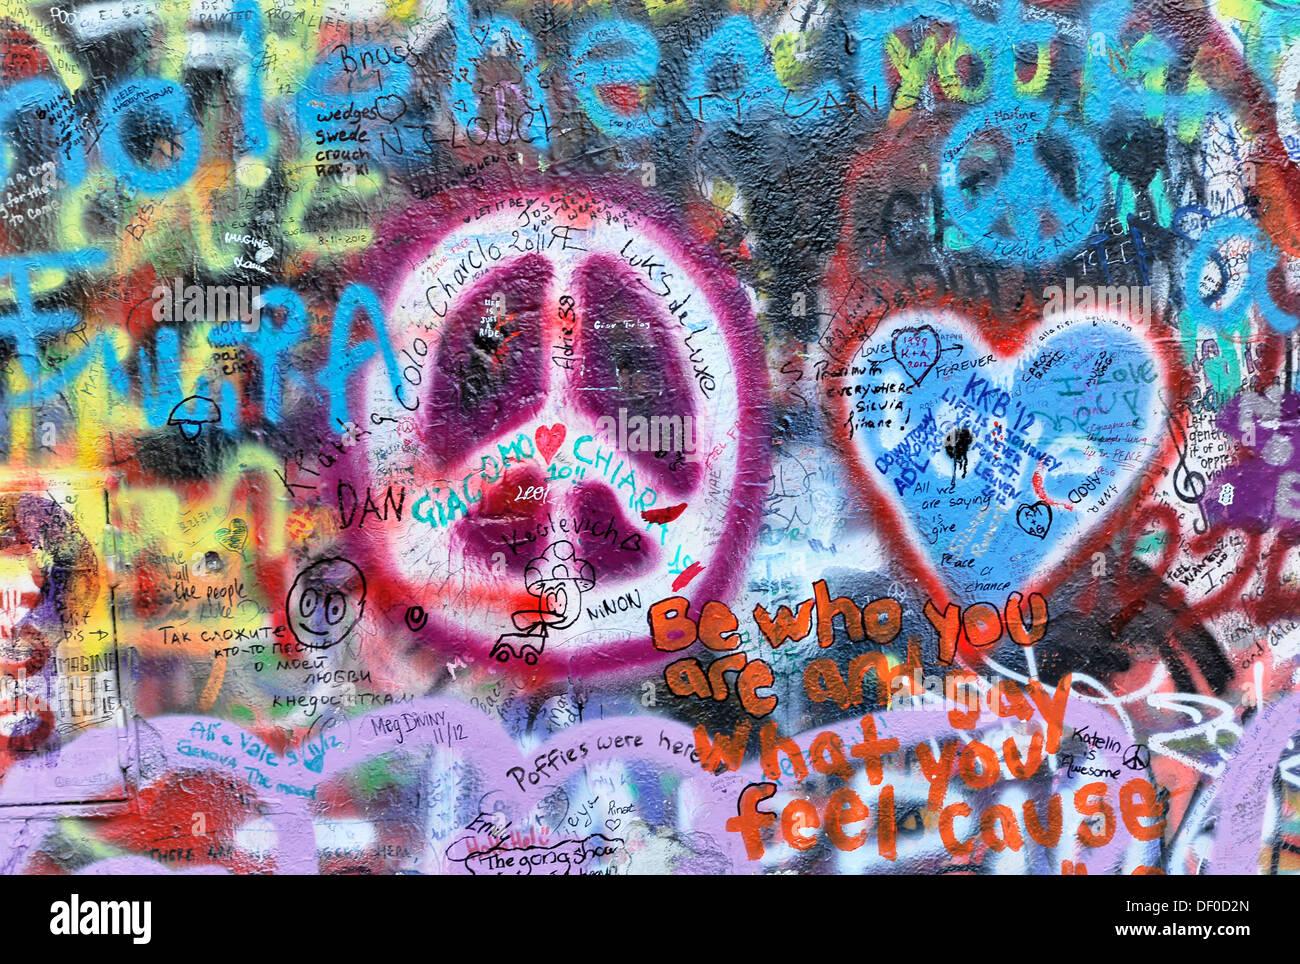 John Lennon wall, graffiti, Prague, Czech Republic - Stock Image